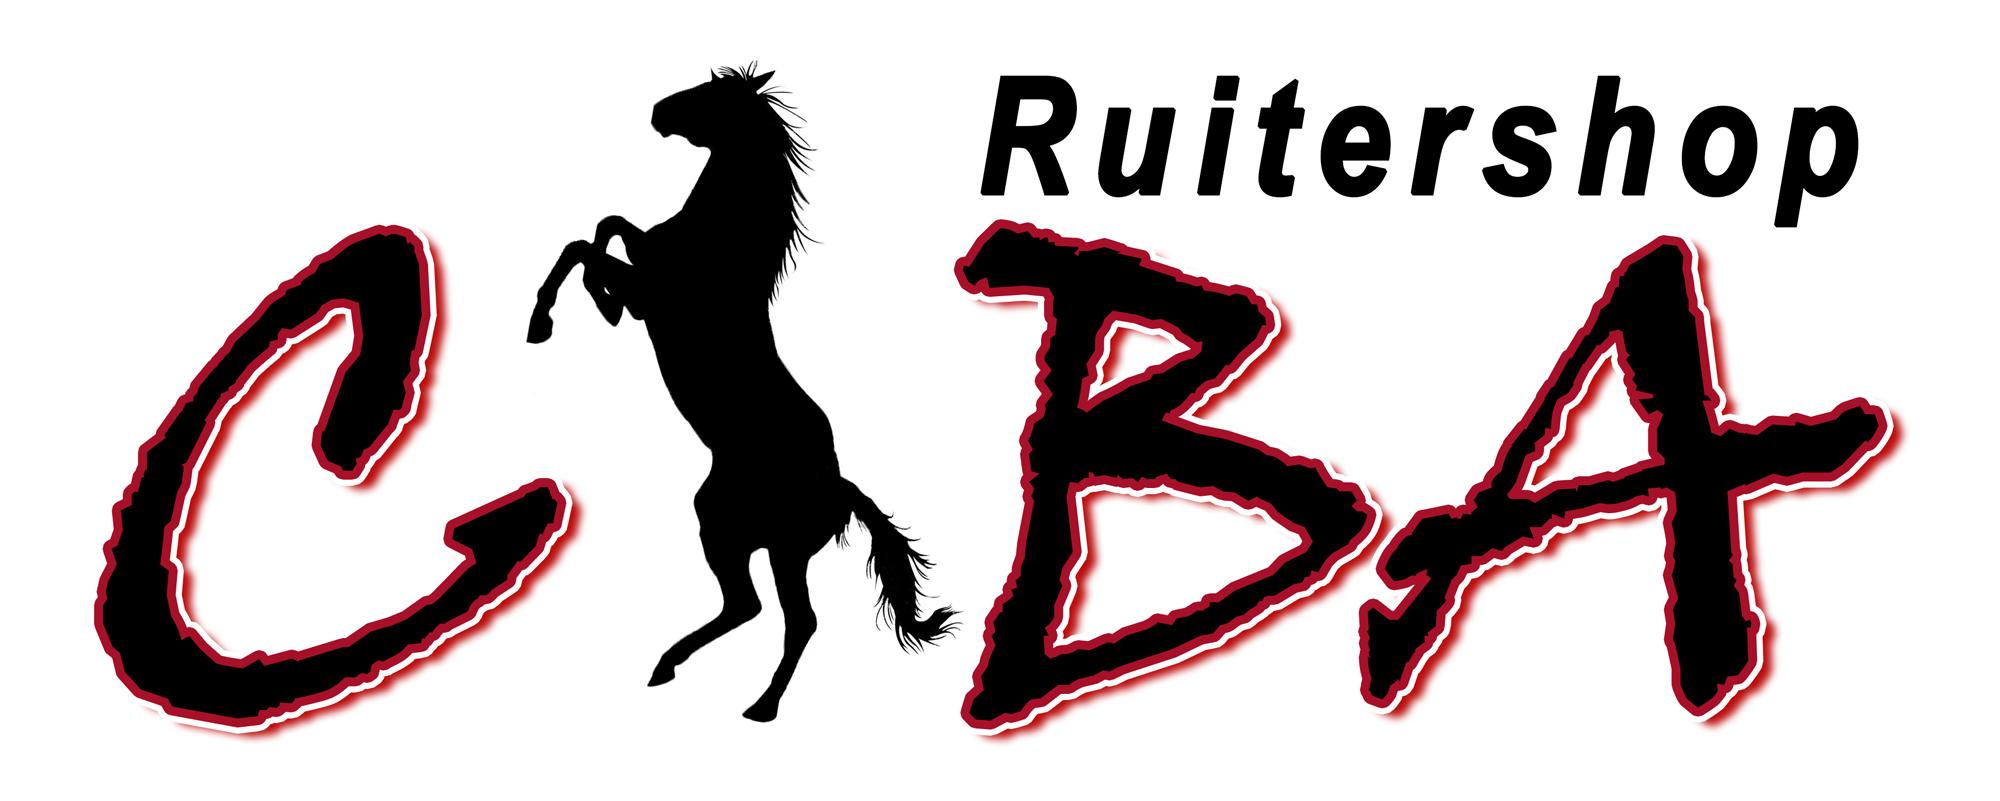 ruitershop-ciba-2016-logo-reworked2